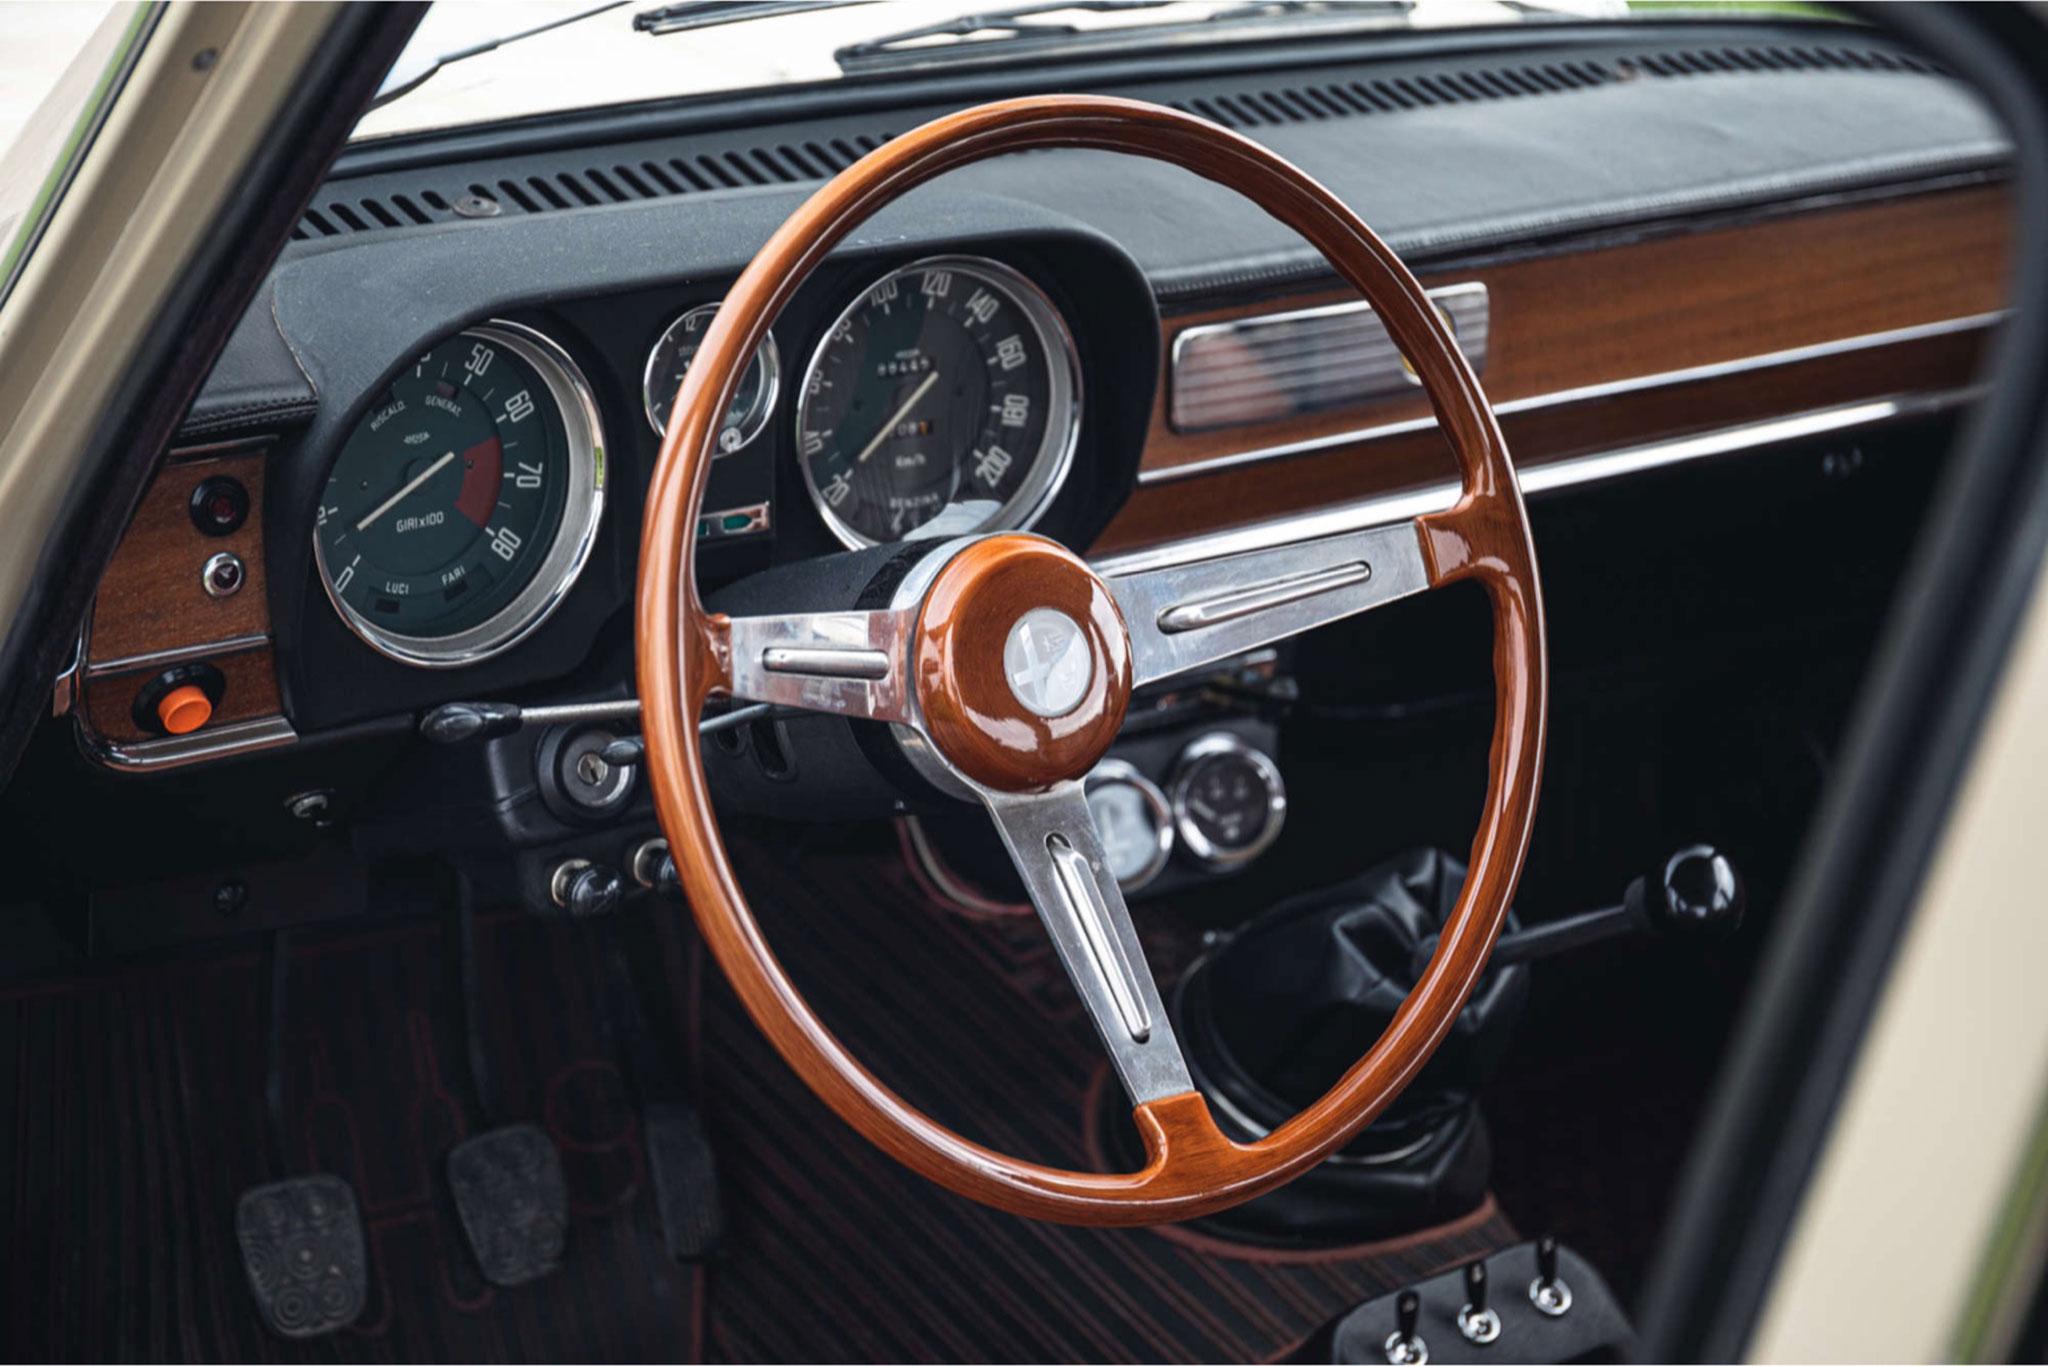 1972 Alfa Romeo Giulia Super 1.3 volant tulipe typique de ces modèles.